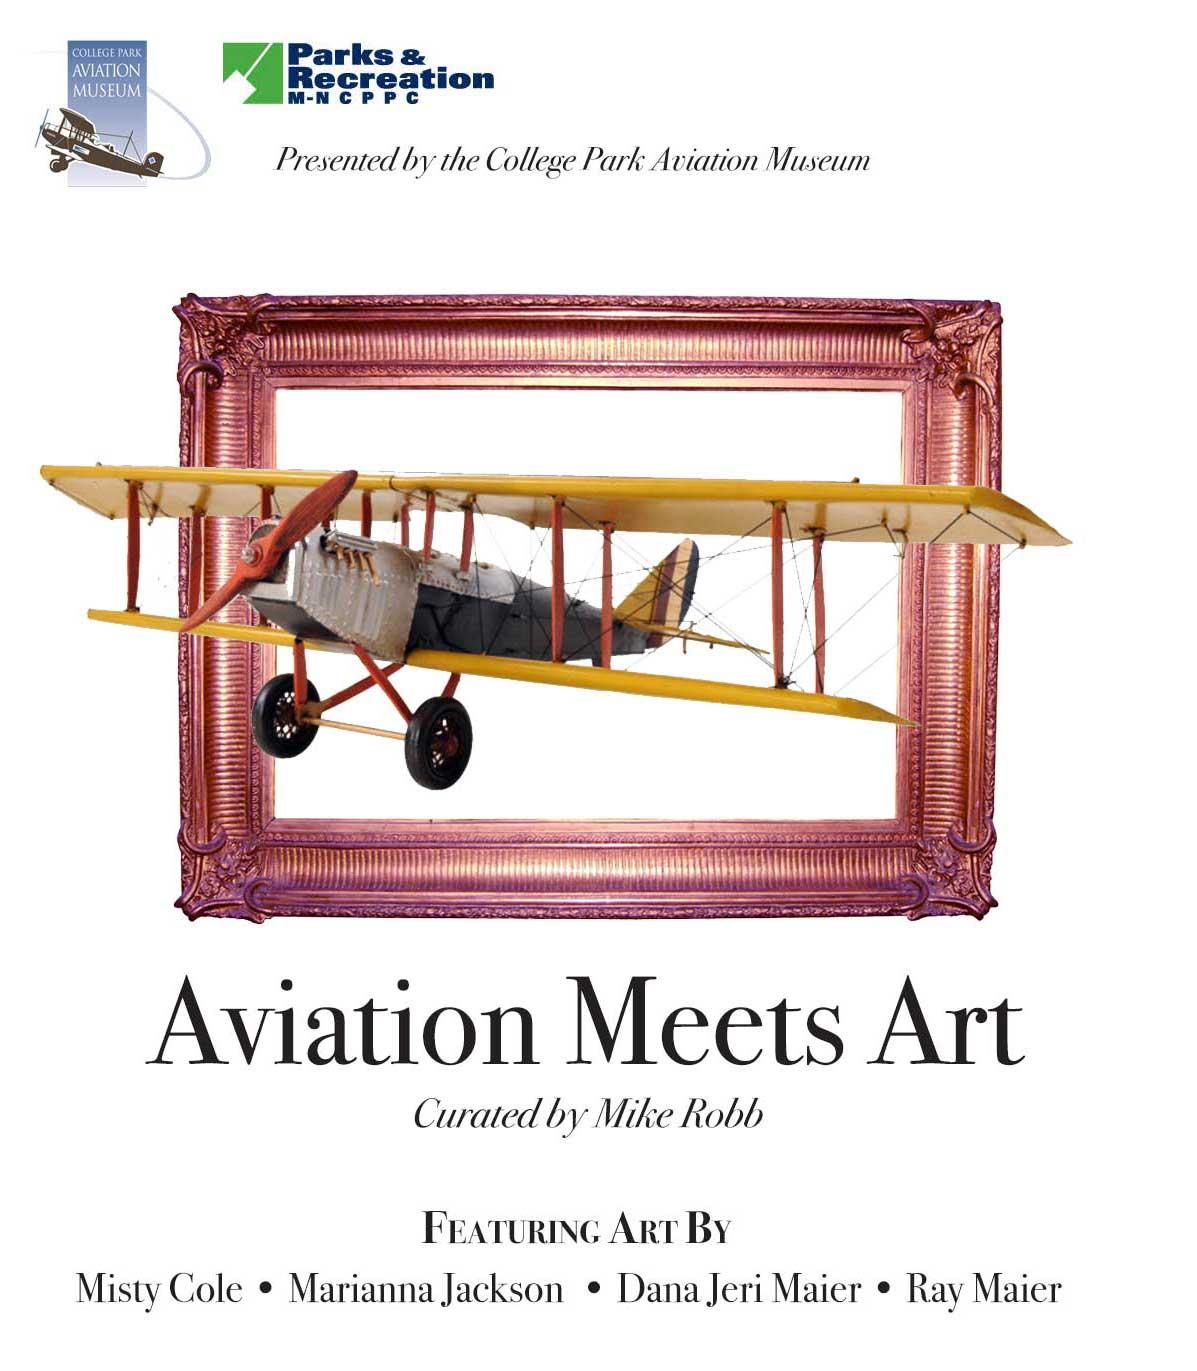 AviationMeetsArt_WebCropped.jpg